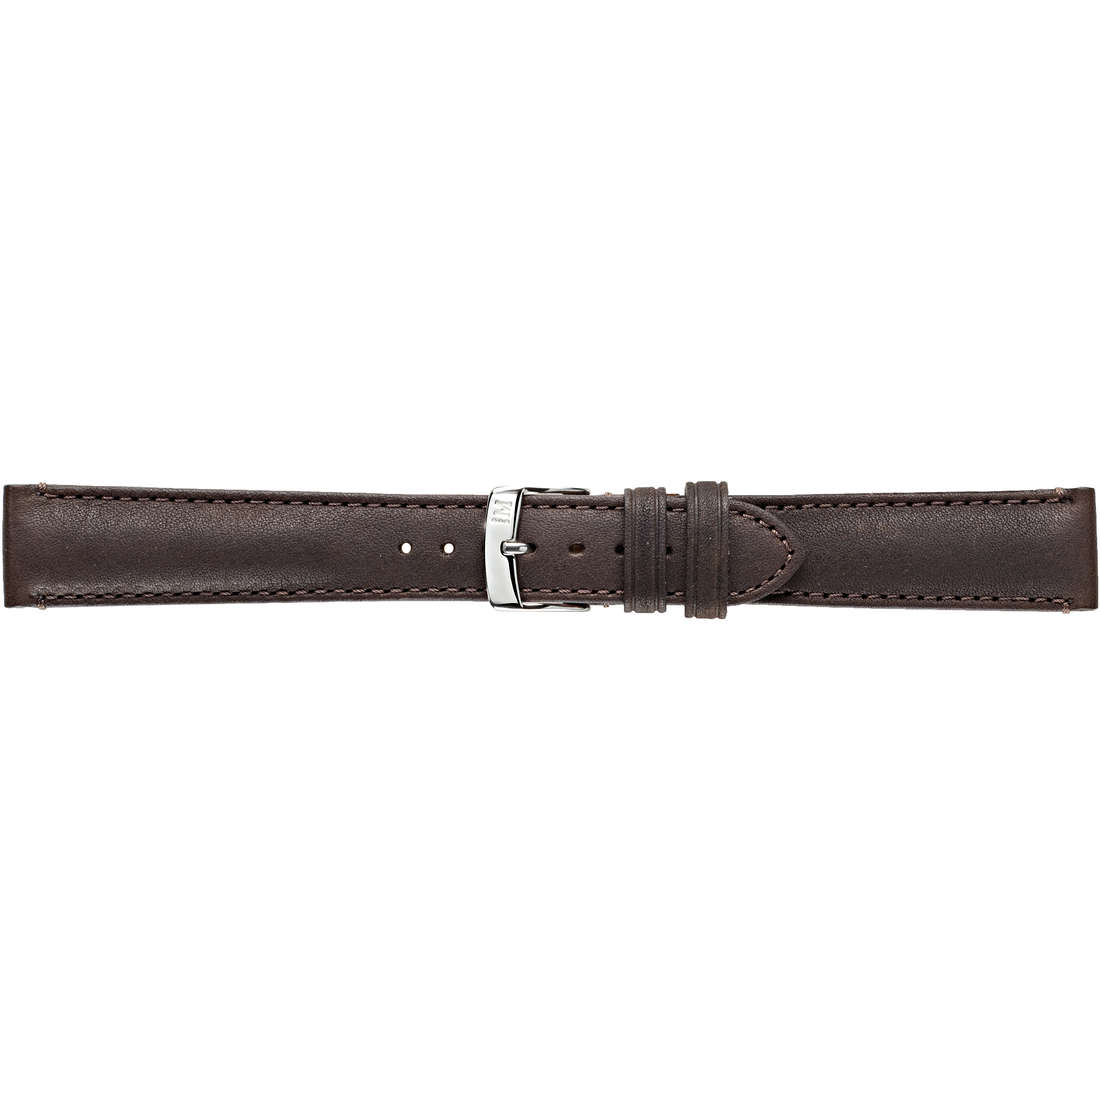 watch watch bands watch straps man Morellato Manufatti A01U3884A61030CR22